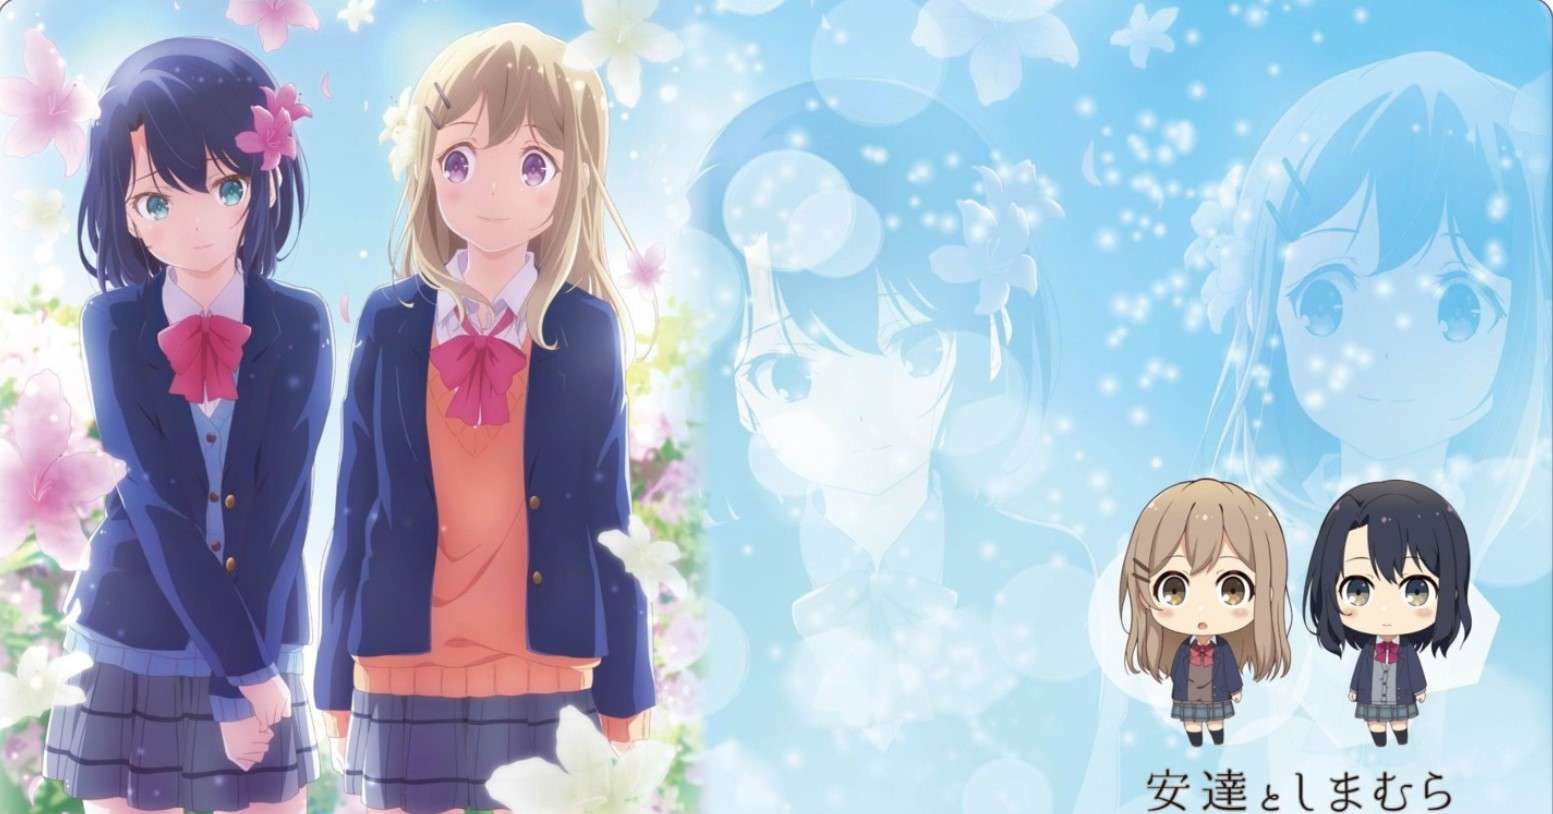 Adachi to Shimamura- best lesbian anime